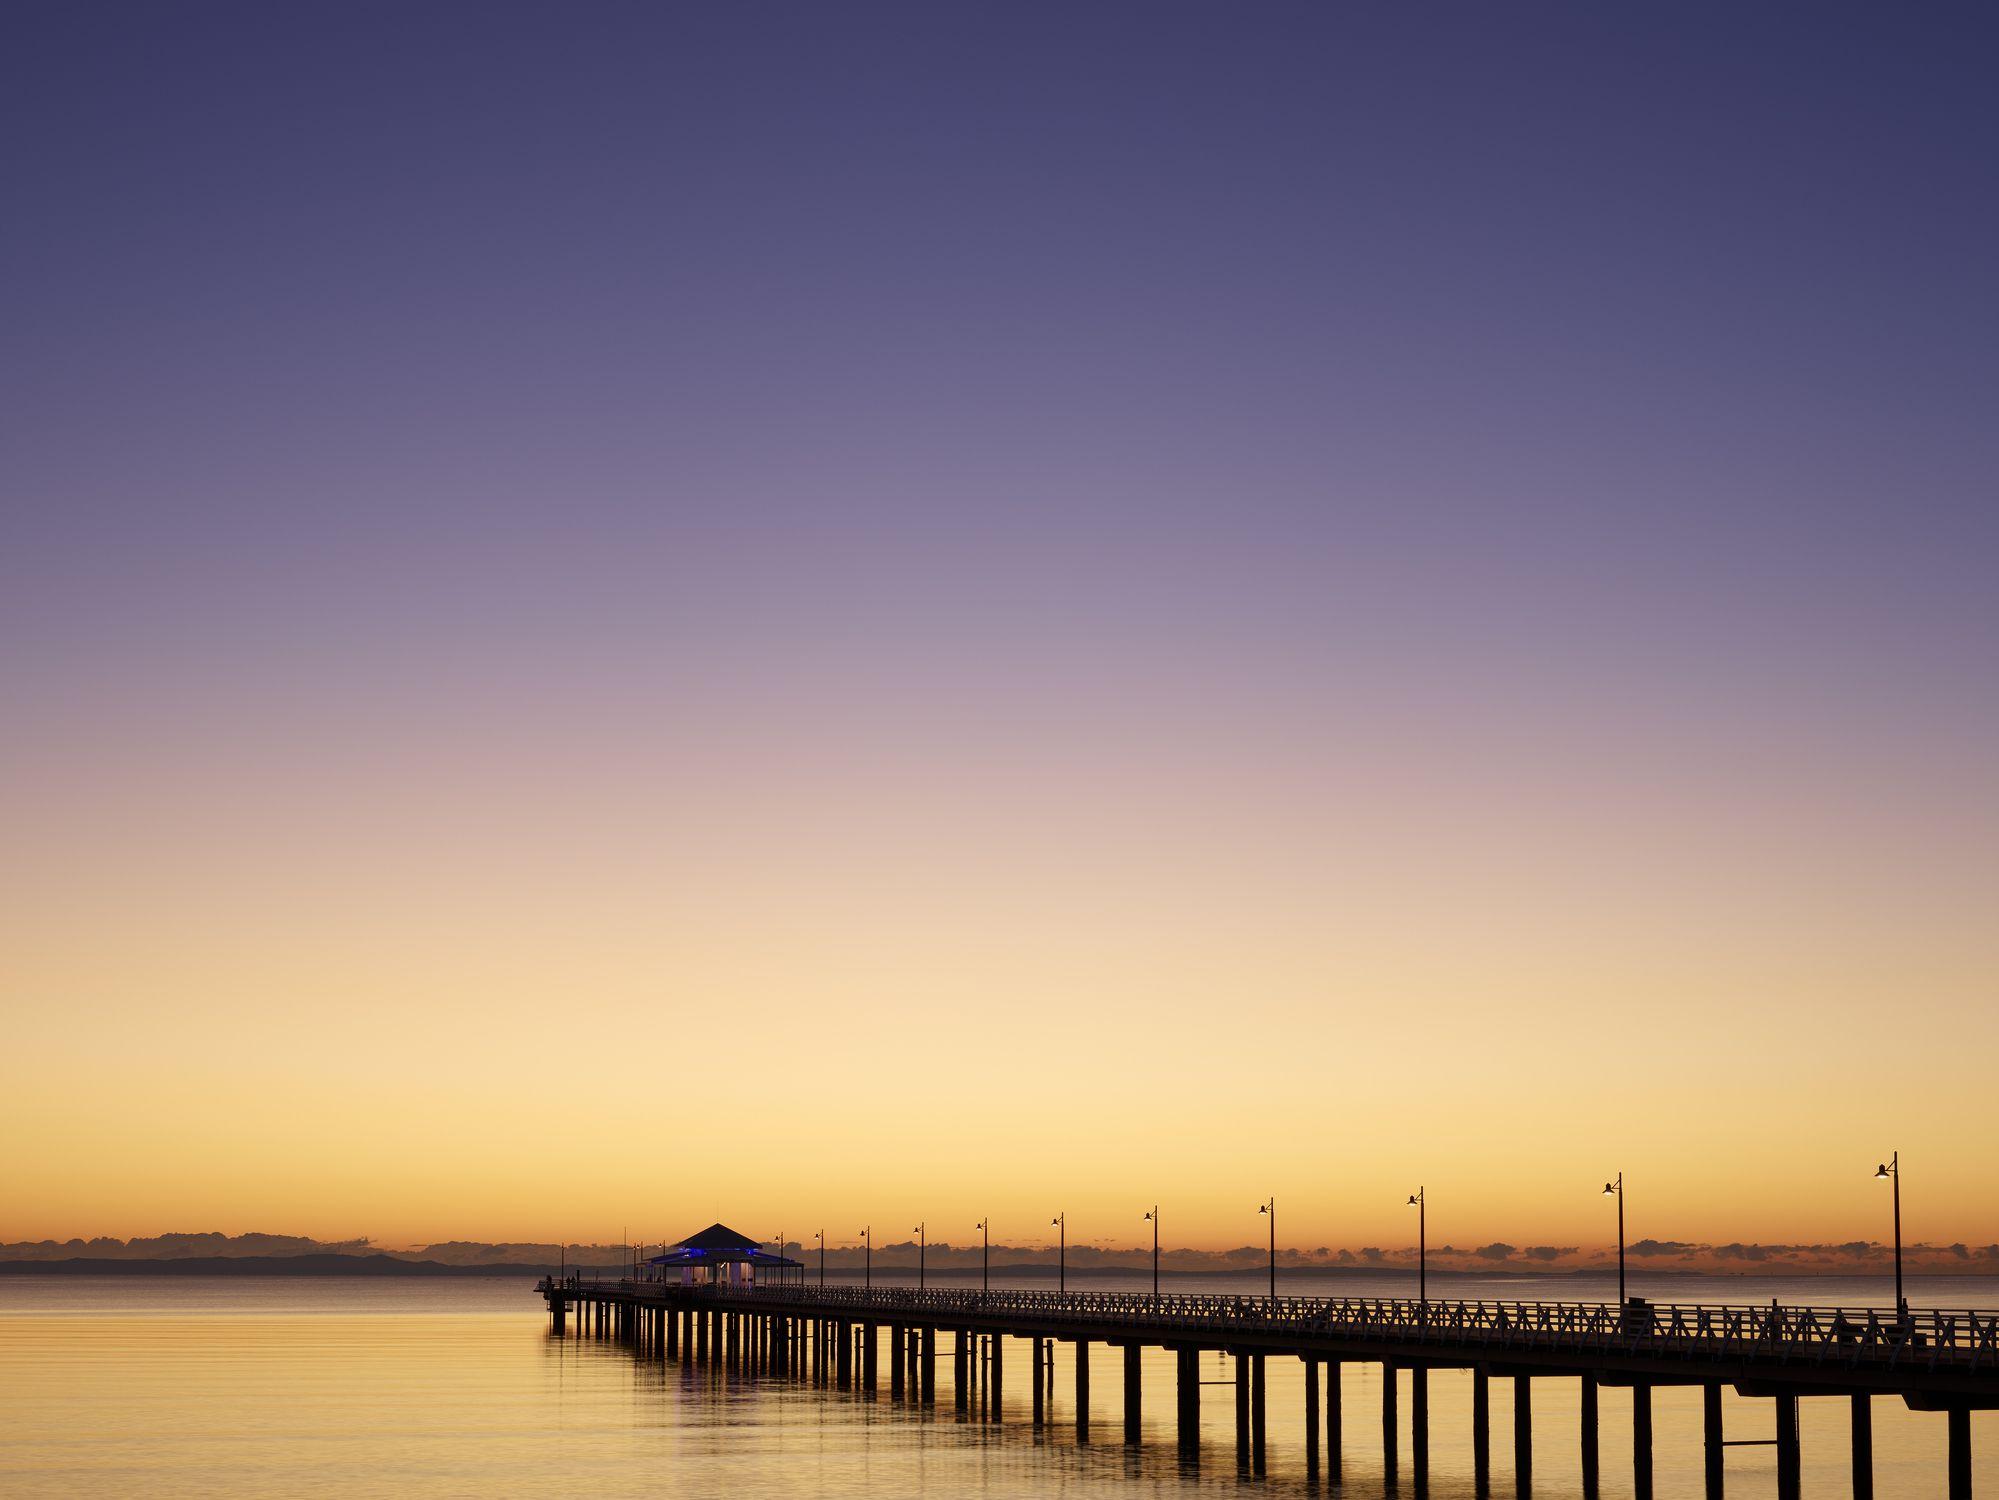 Sunrise over Shorncliffe Pier